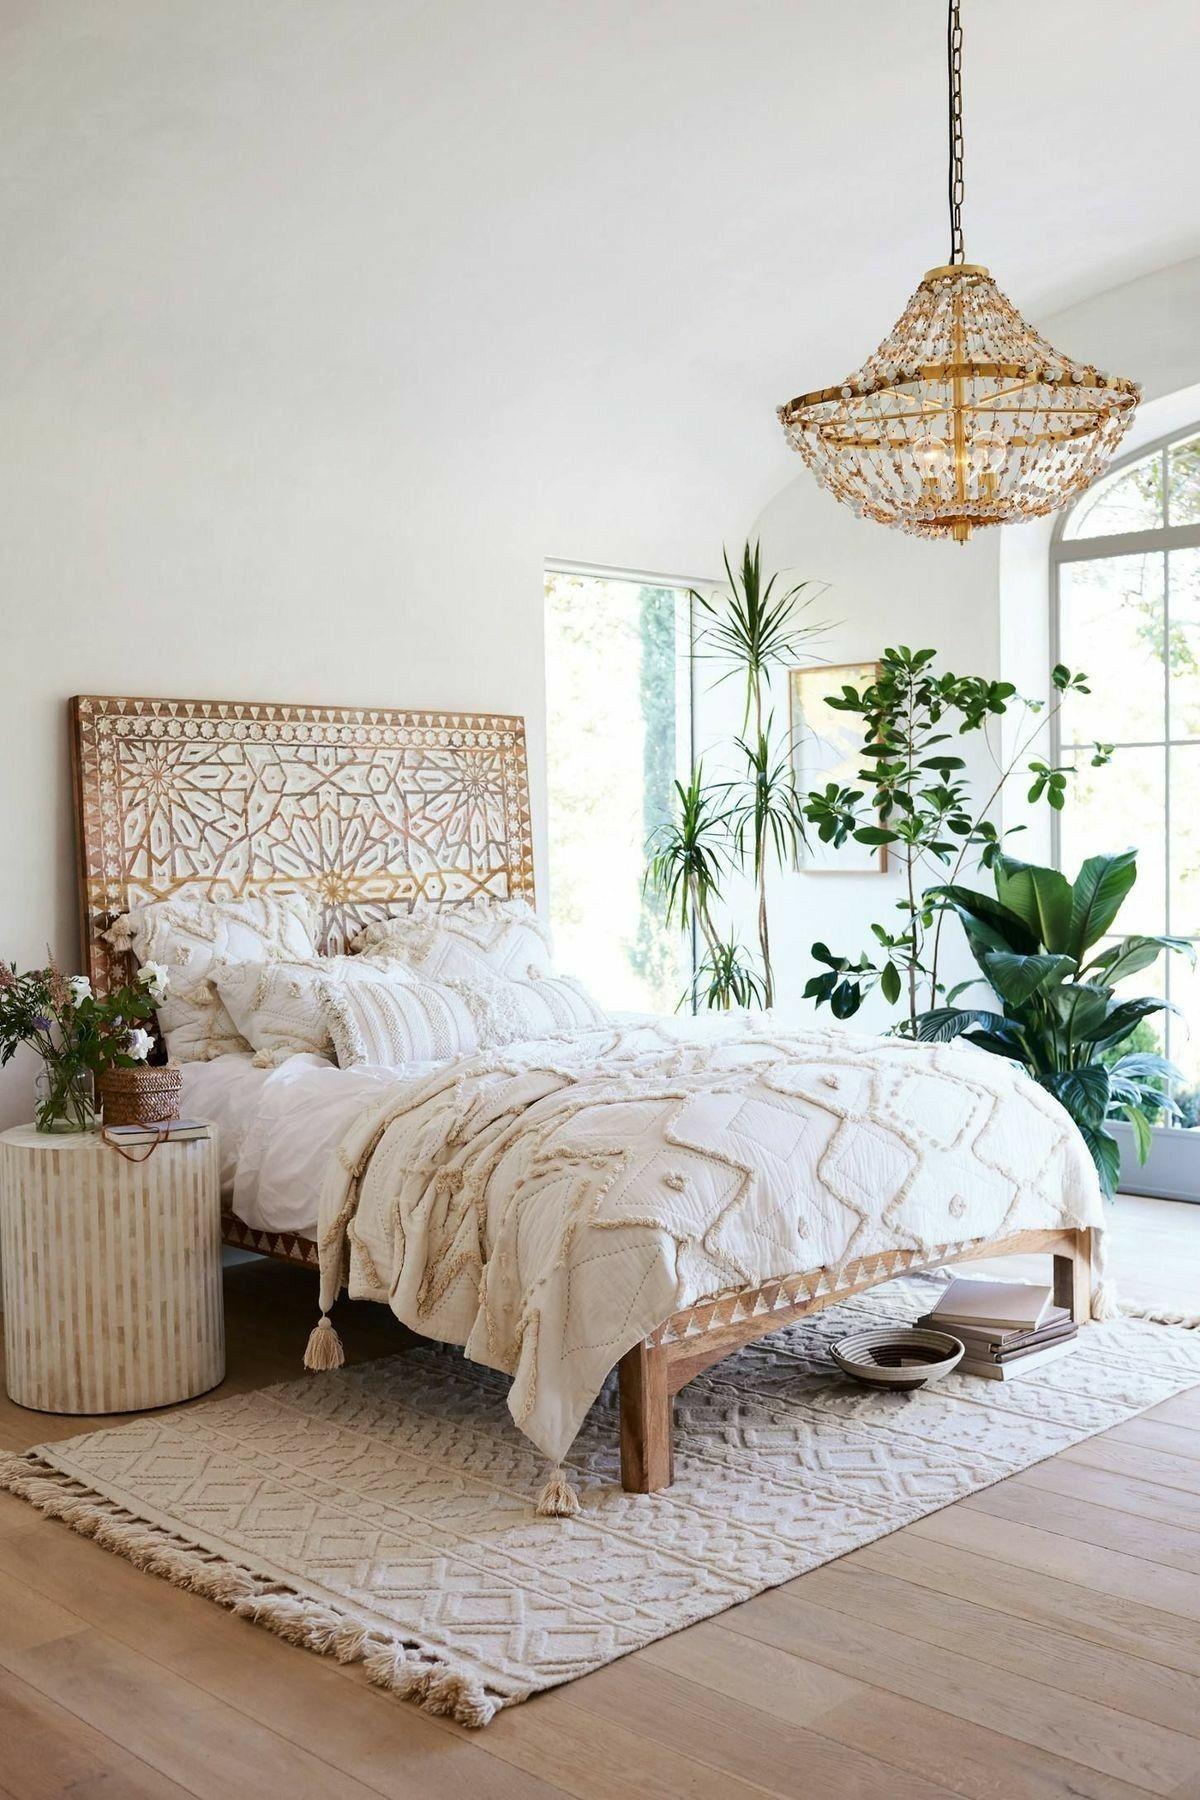 "<p><a href=""http://www.homeinteriordesign.org/2018/02/short-guide-to-interior-decoration.html"">Short guide to interior decoration</a></p>"